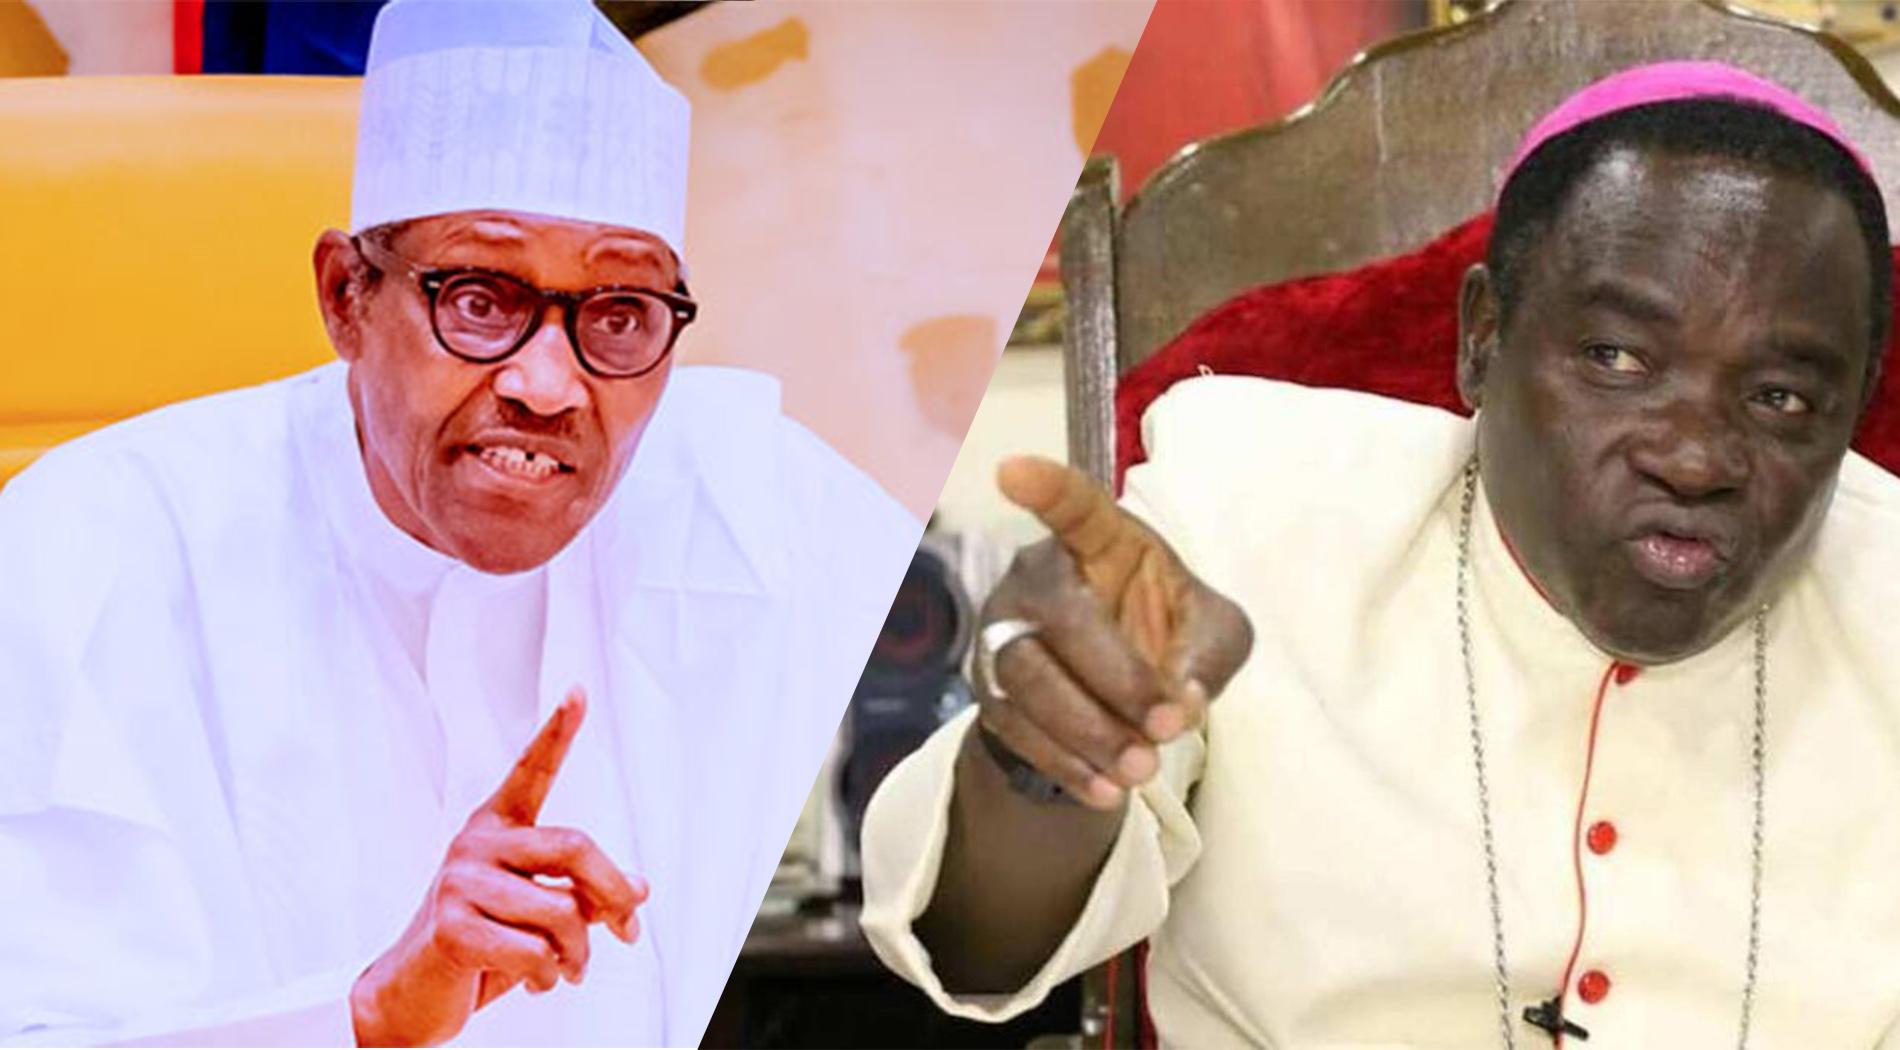 Inside the Bishop Kukah speech that angered Buhari